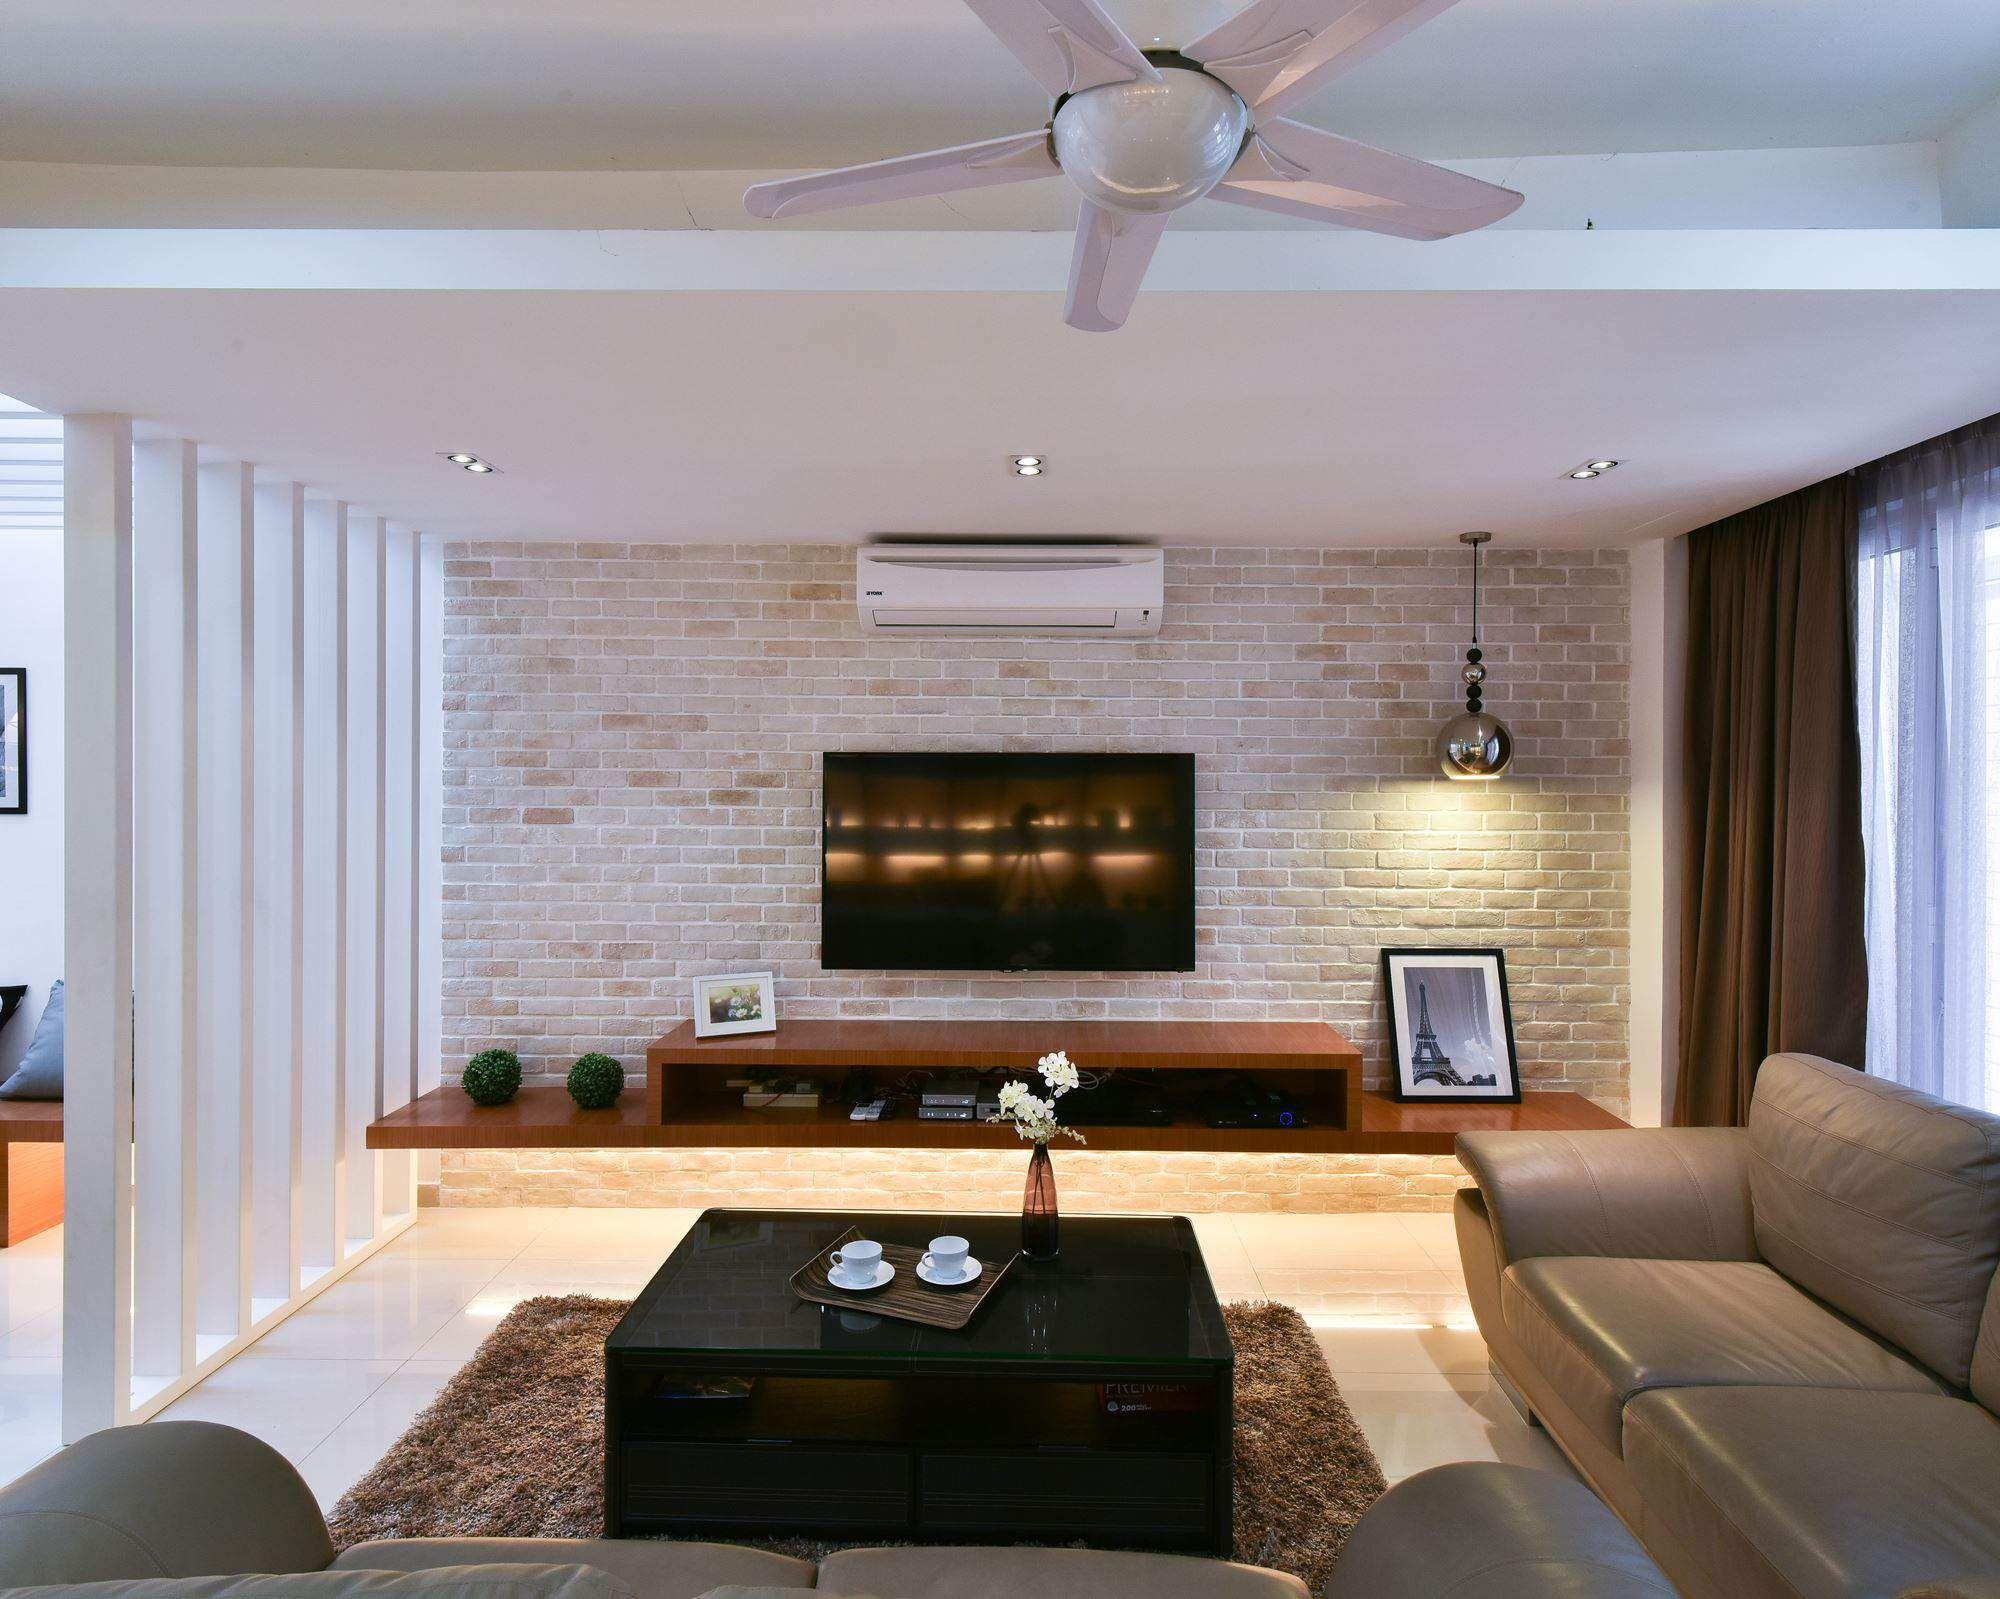 Interior design ideas for terraced houses